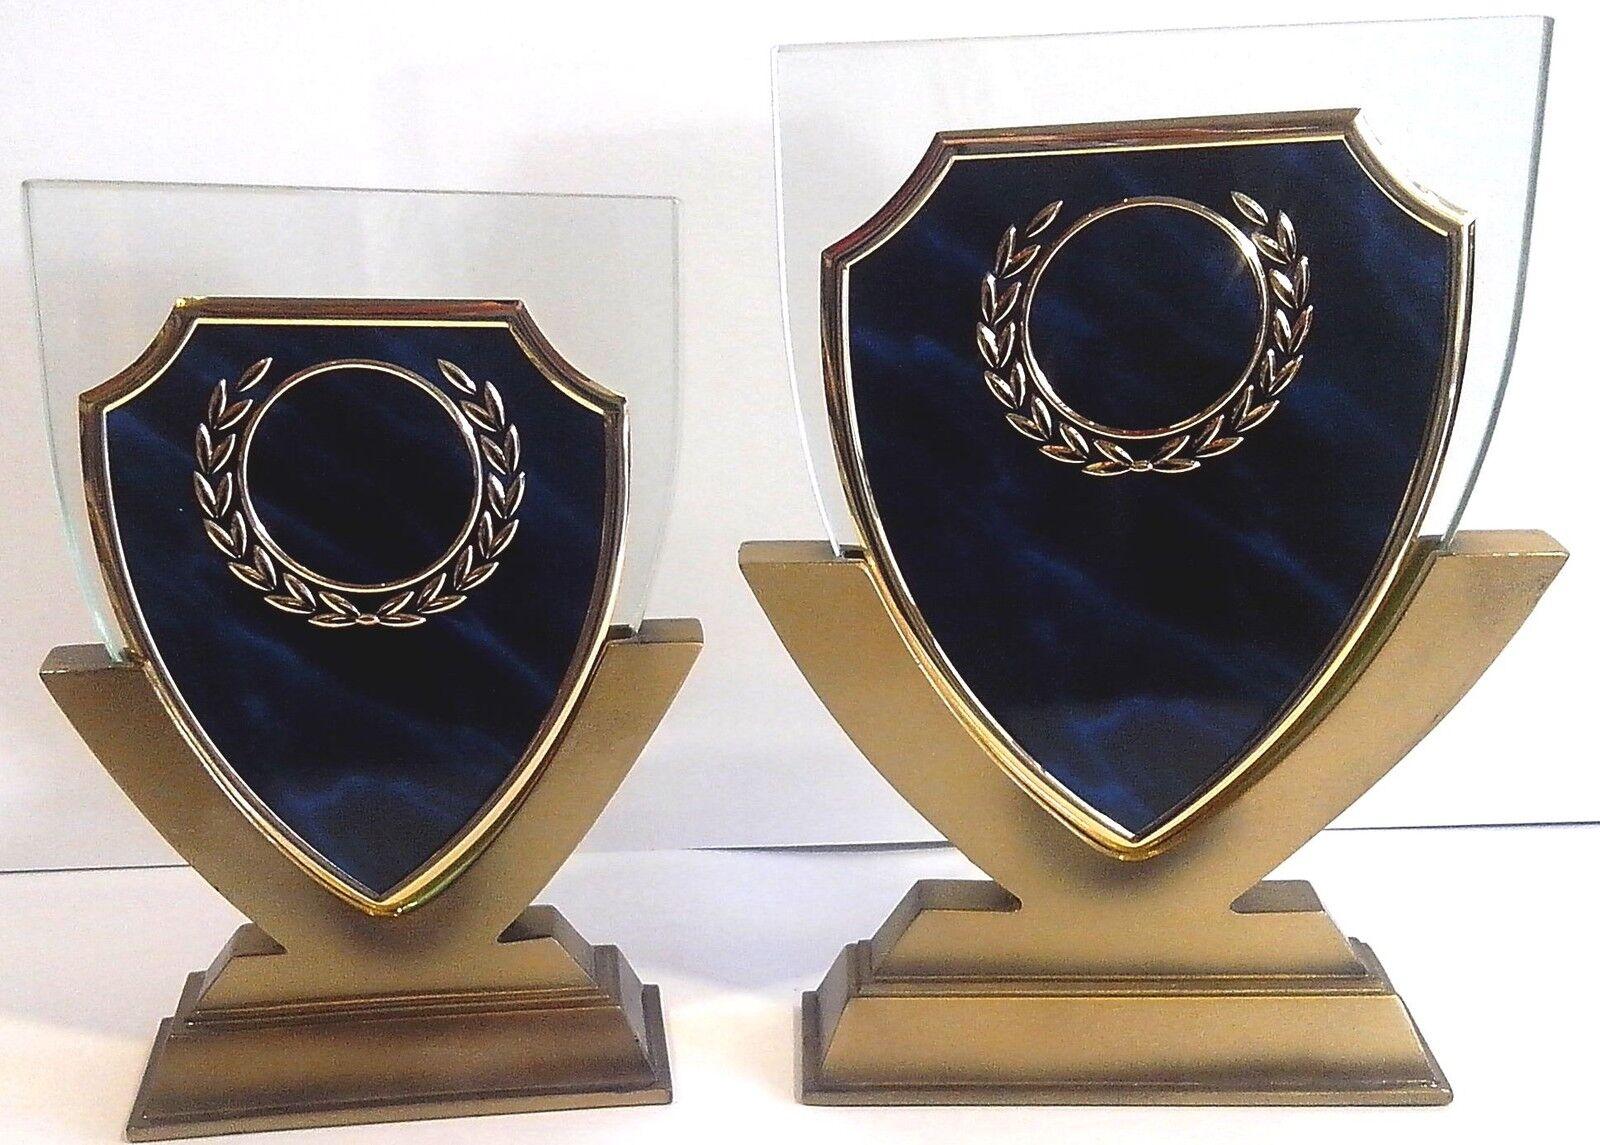 Pokal 2-er-Serie & Emblem Vereinspokal Sportauszeichnung Wanderpokal